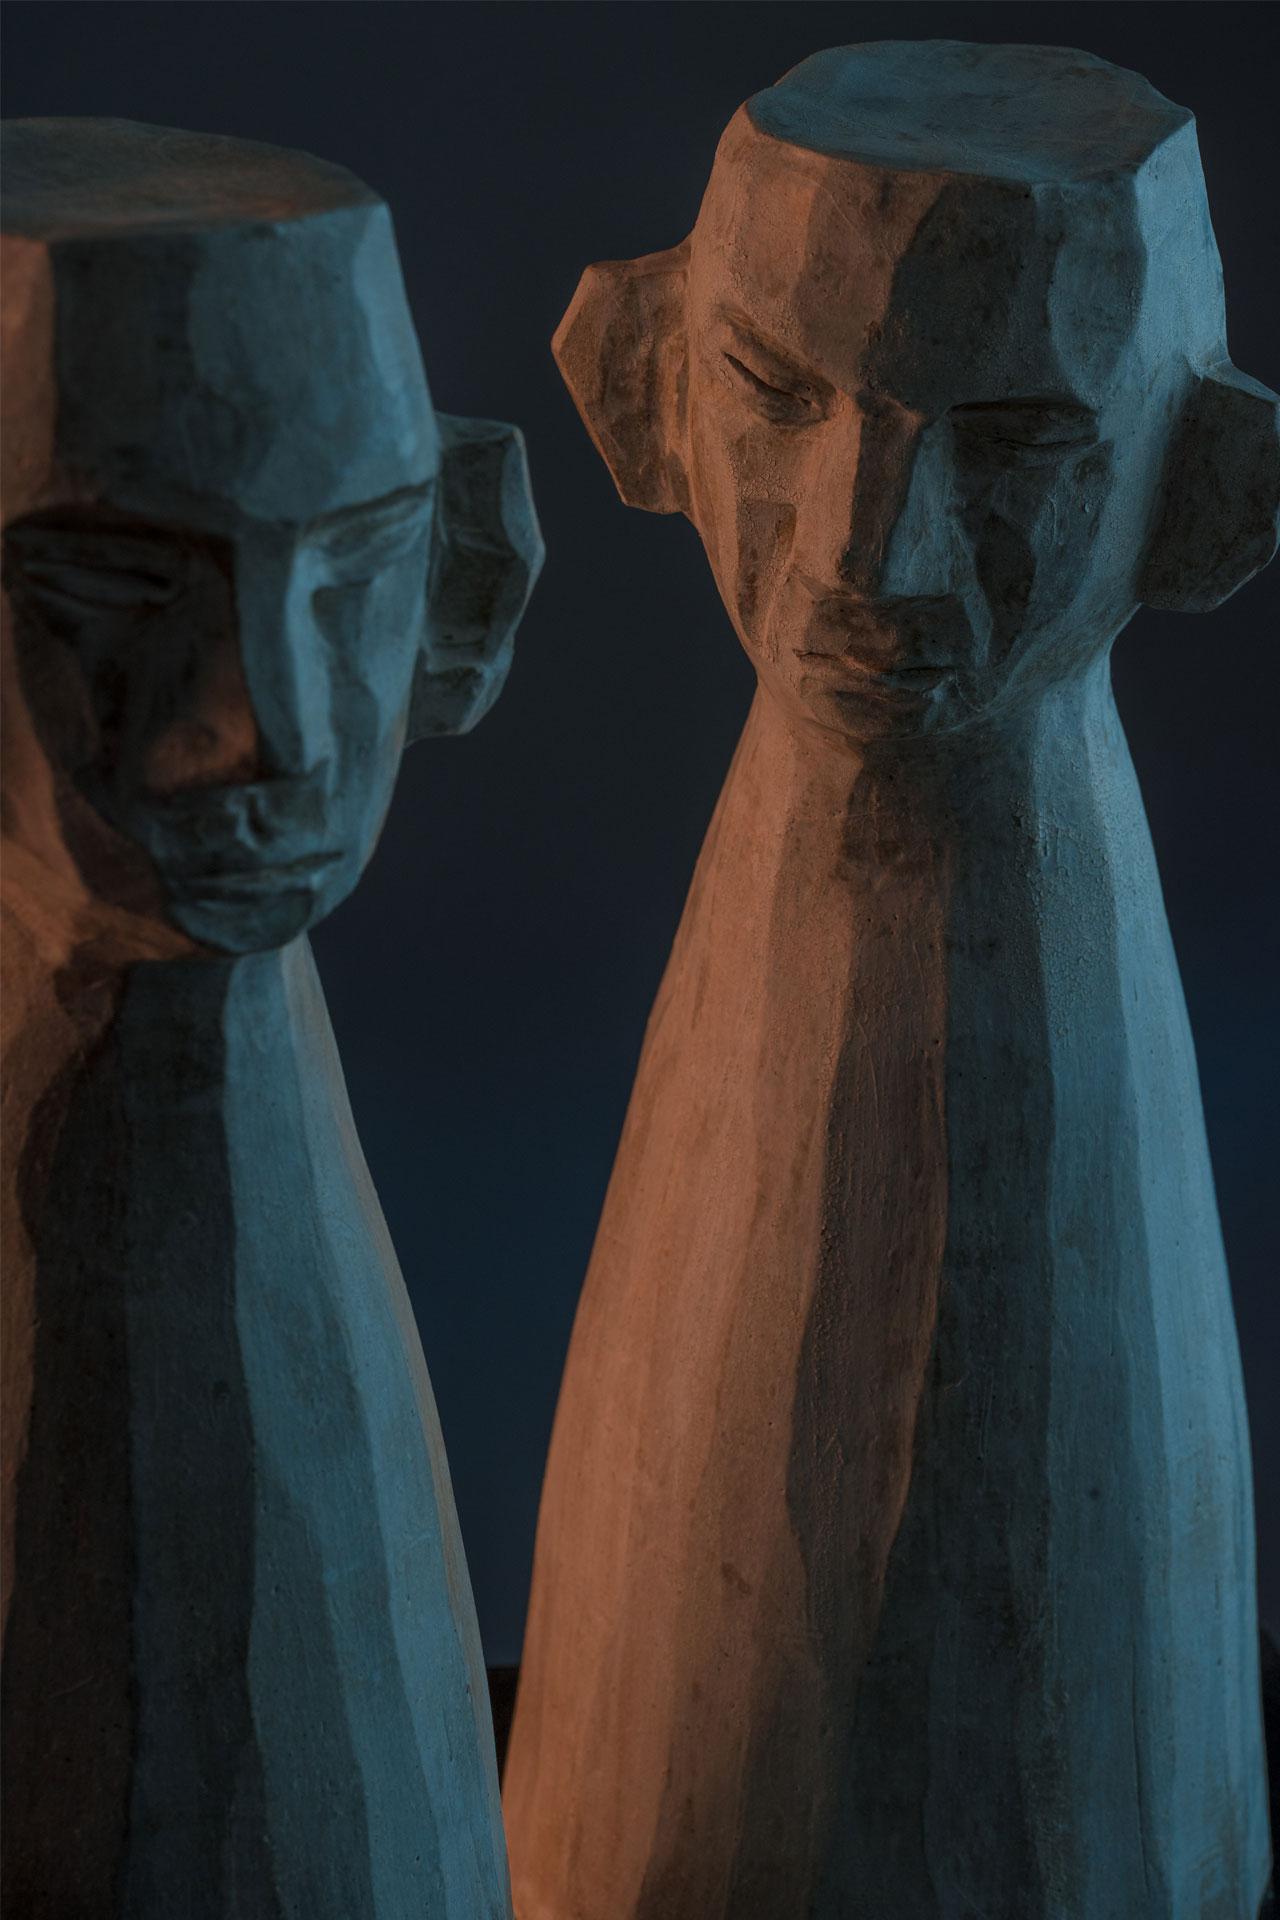 gallery-101-seung-jun-seo-ceramics-artist-asheville-north-carolina-1.jpg